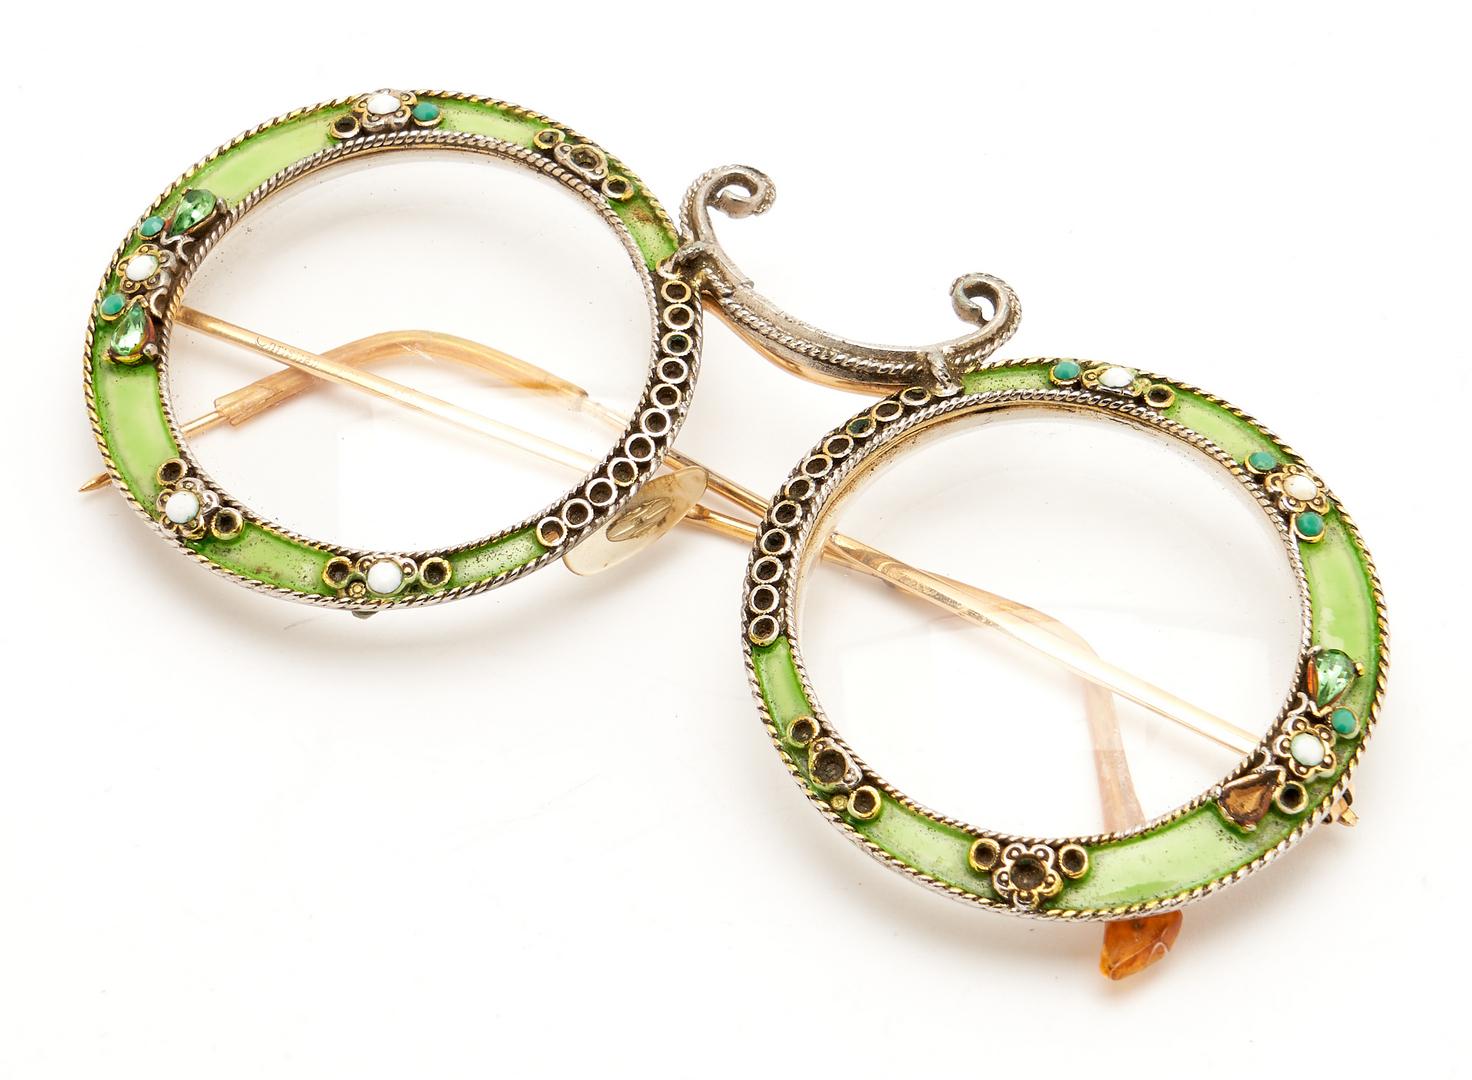 Lot 936: Amber & Designer Jewelry, incl. Dior Eyeglasses